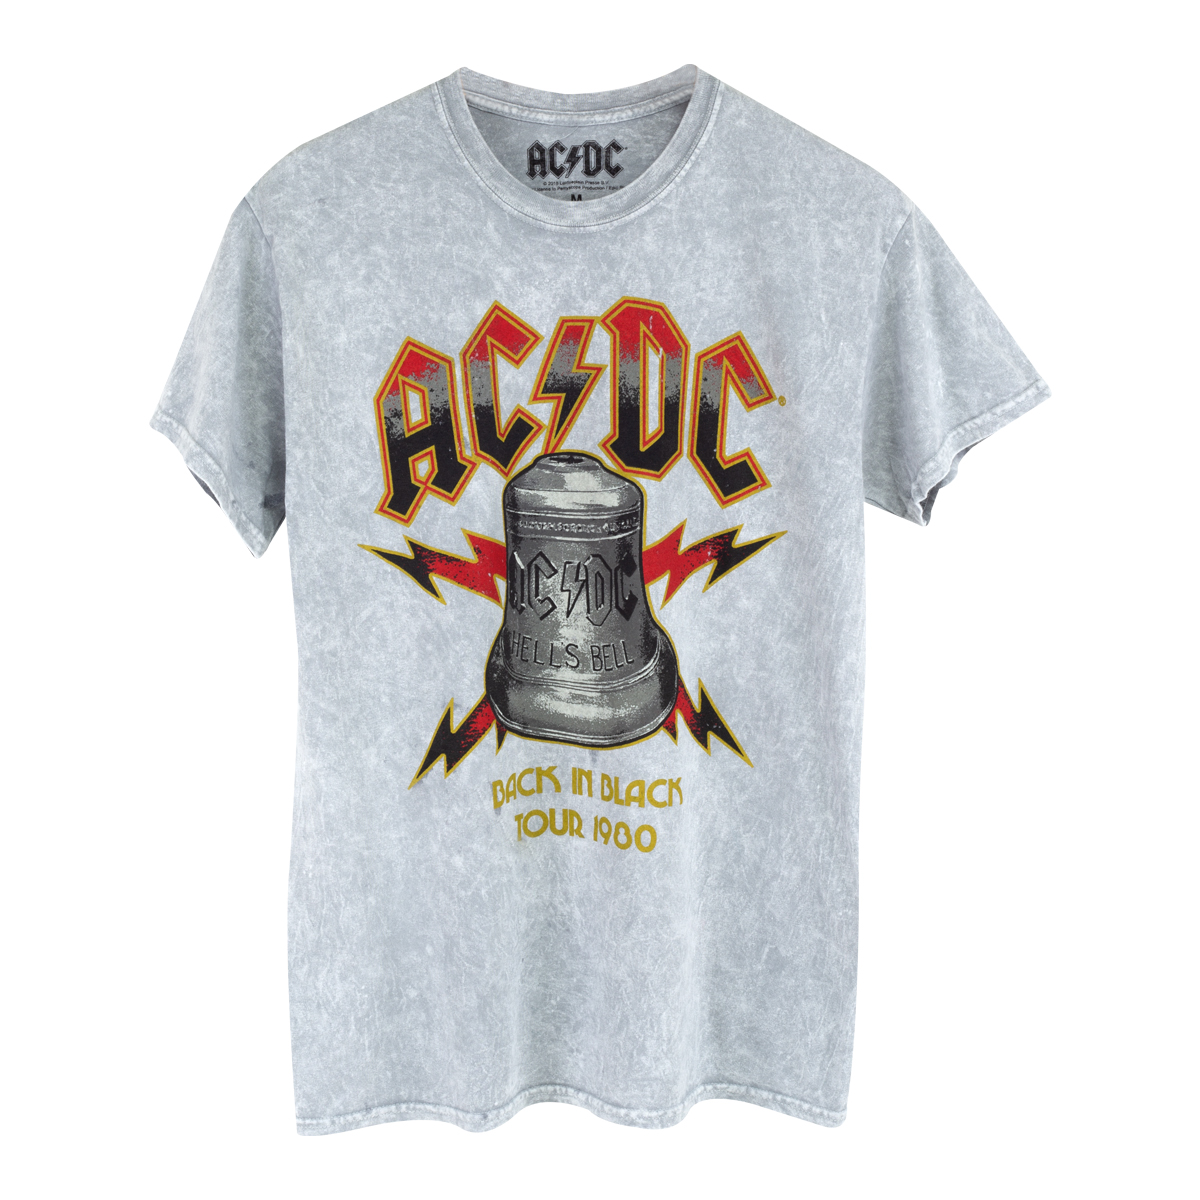 AC/DC Back in Black 1980 Tour T-shirt